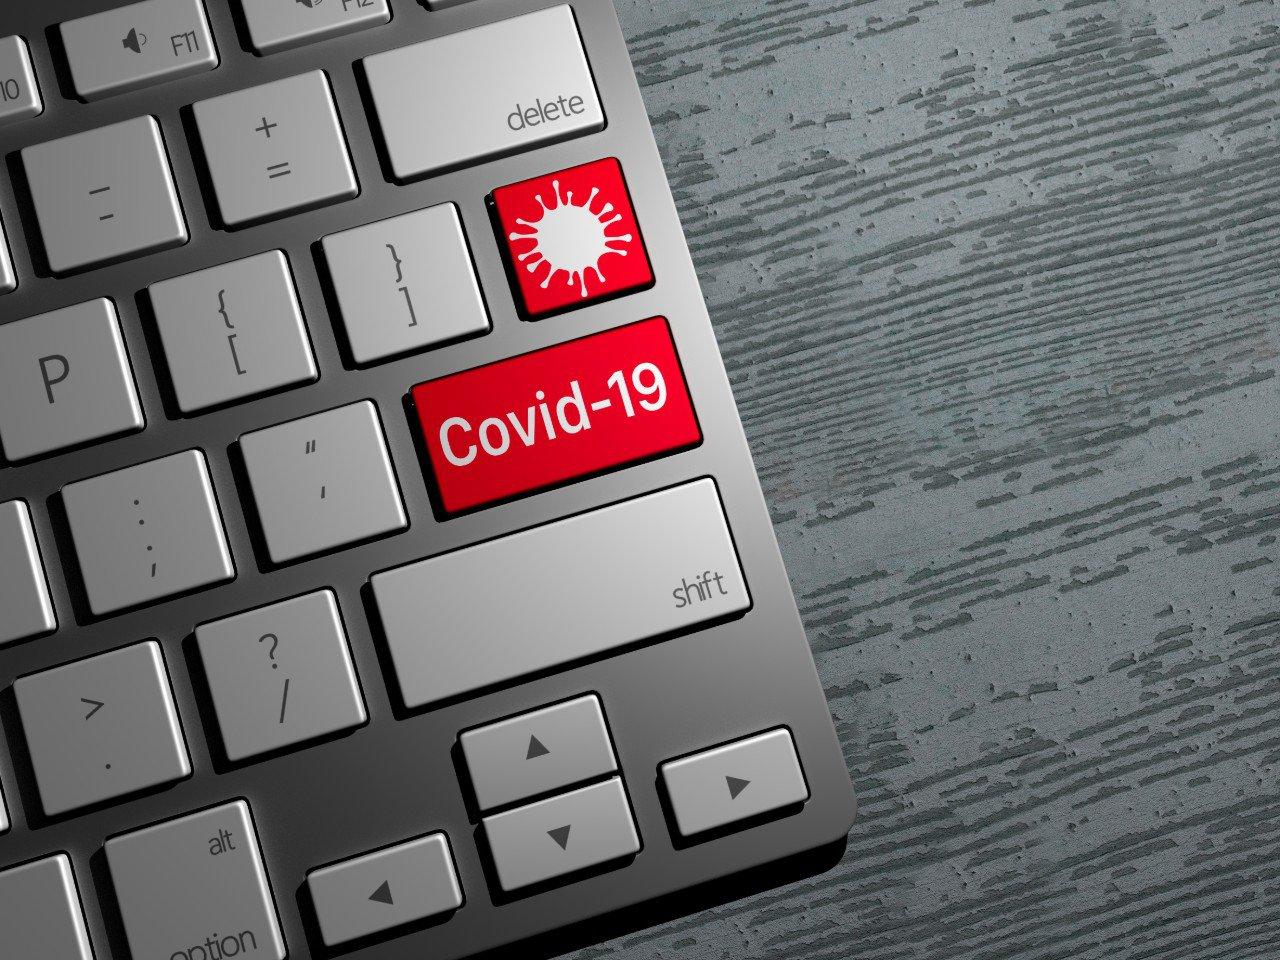 A red keyboard button with coronavirus written on it.